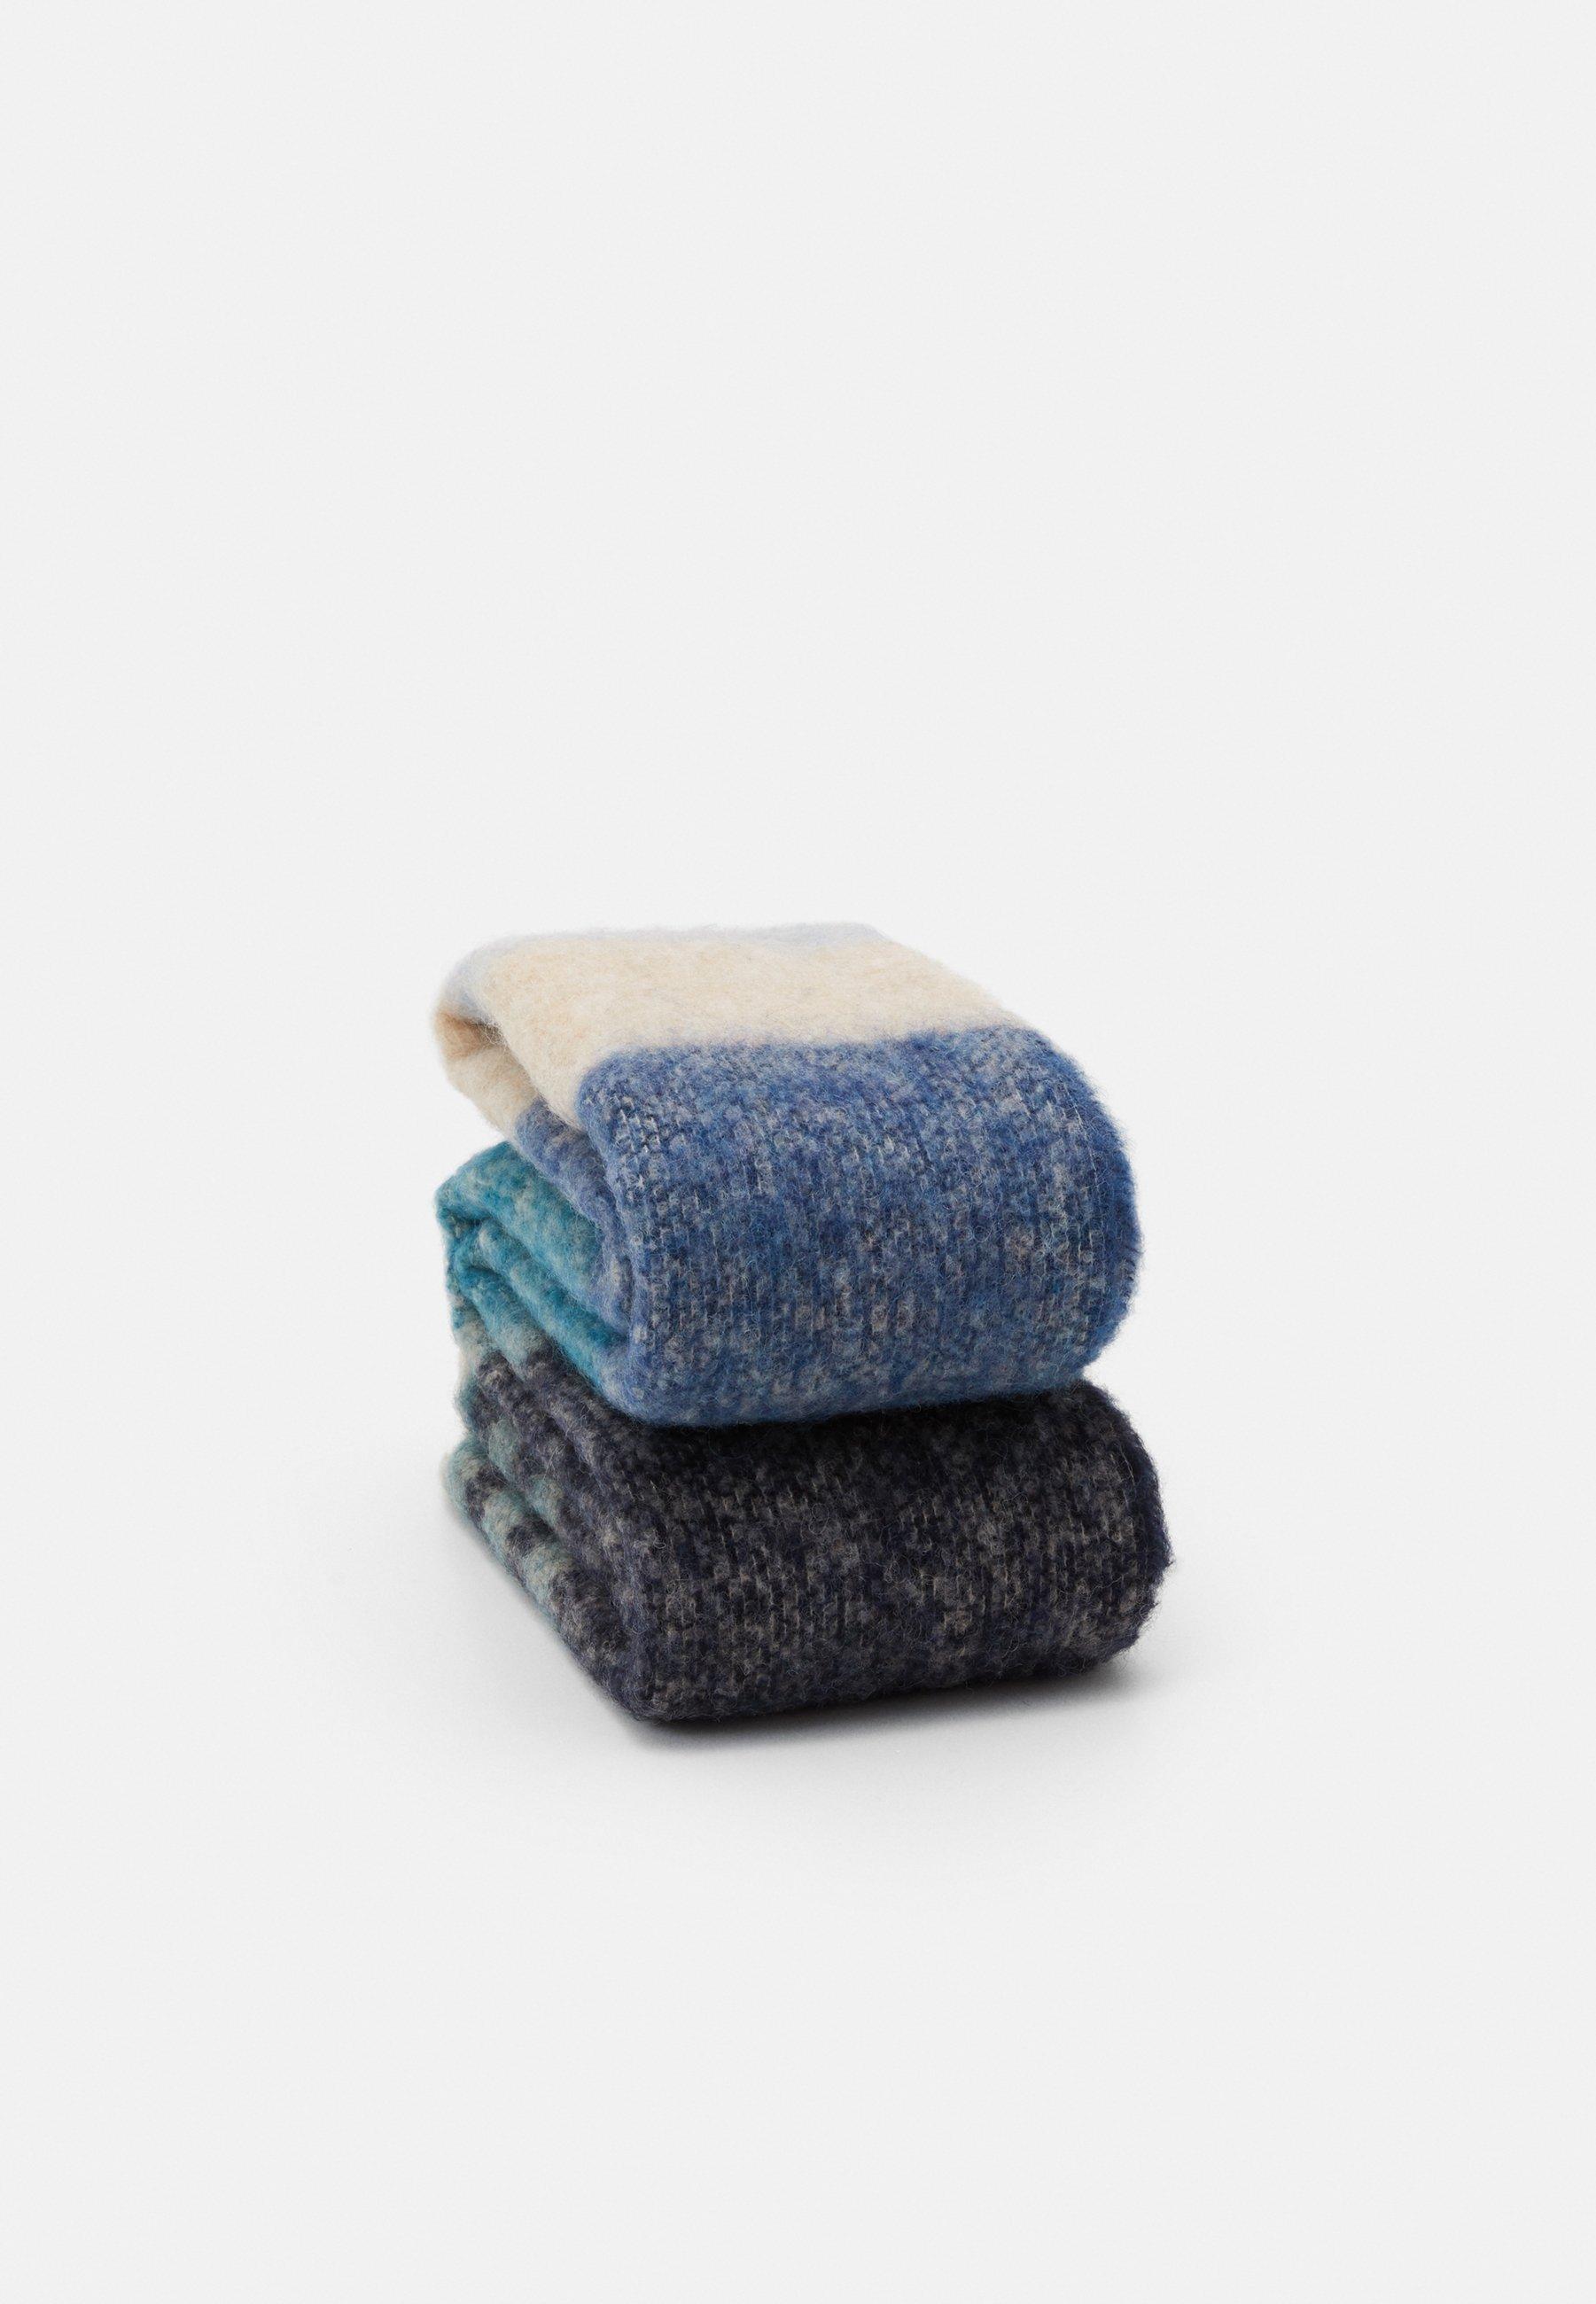 Paul Smith Scarf - Schal Dark Blue/multicolor/dunkelblau